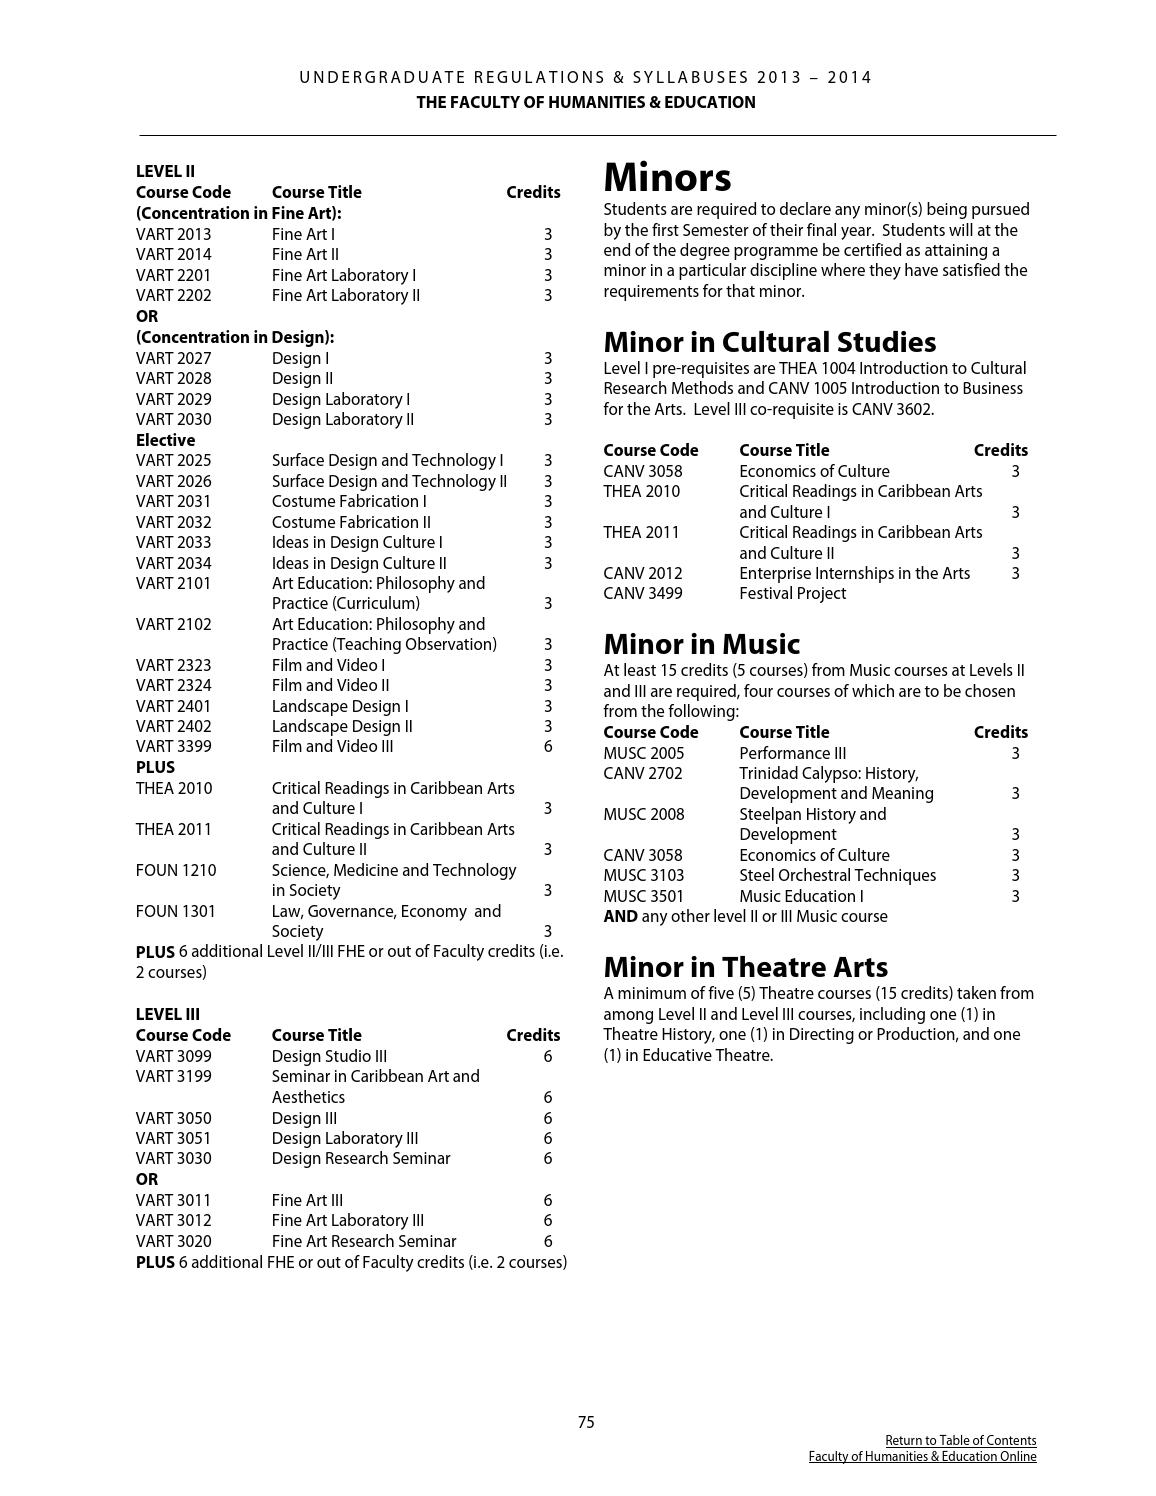 Faculty of Humanities & Education Undergraduate Booklet 2013